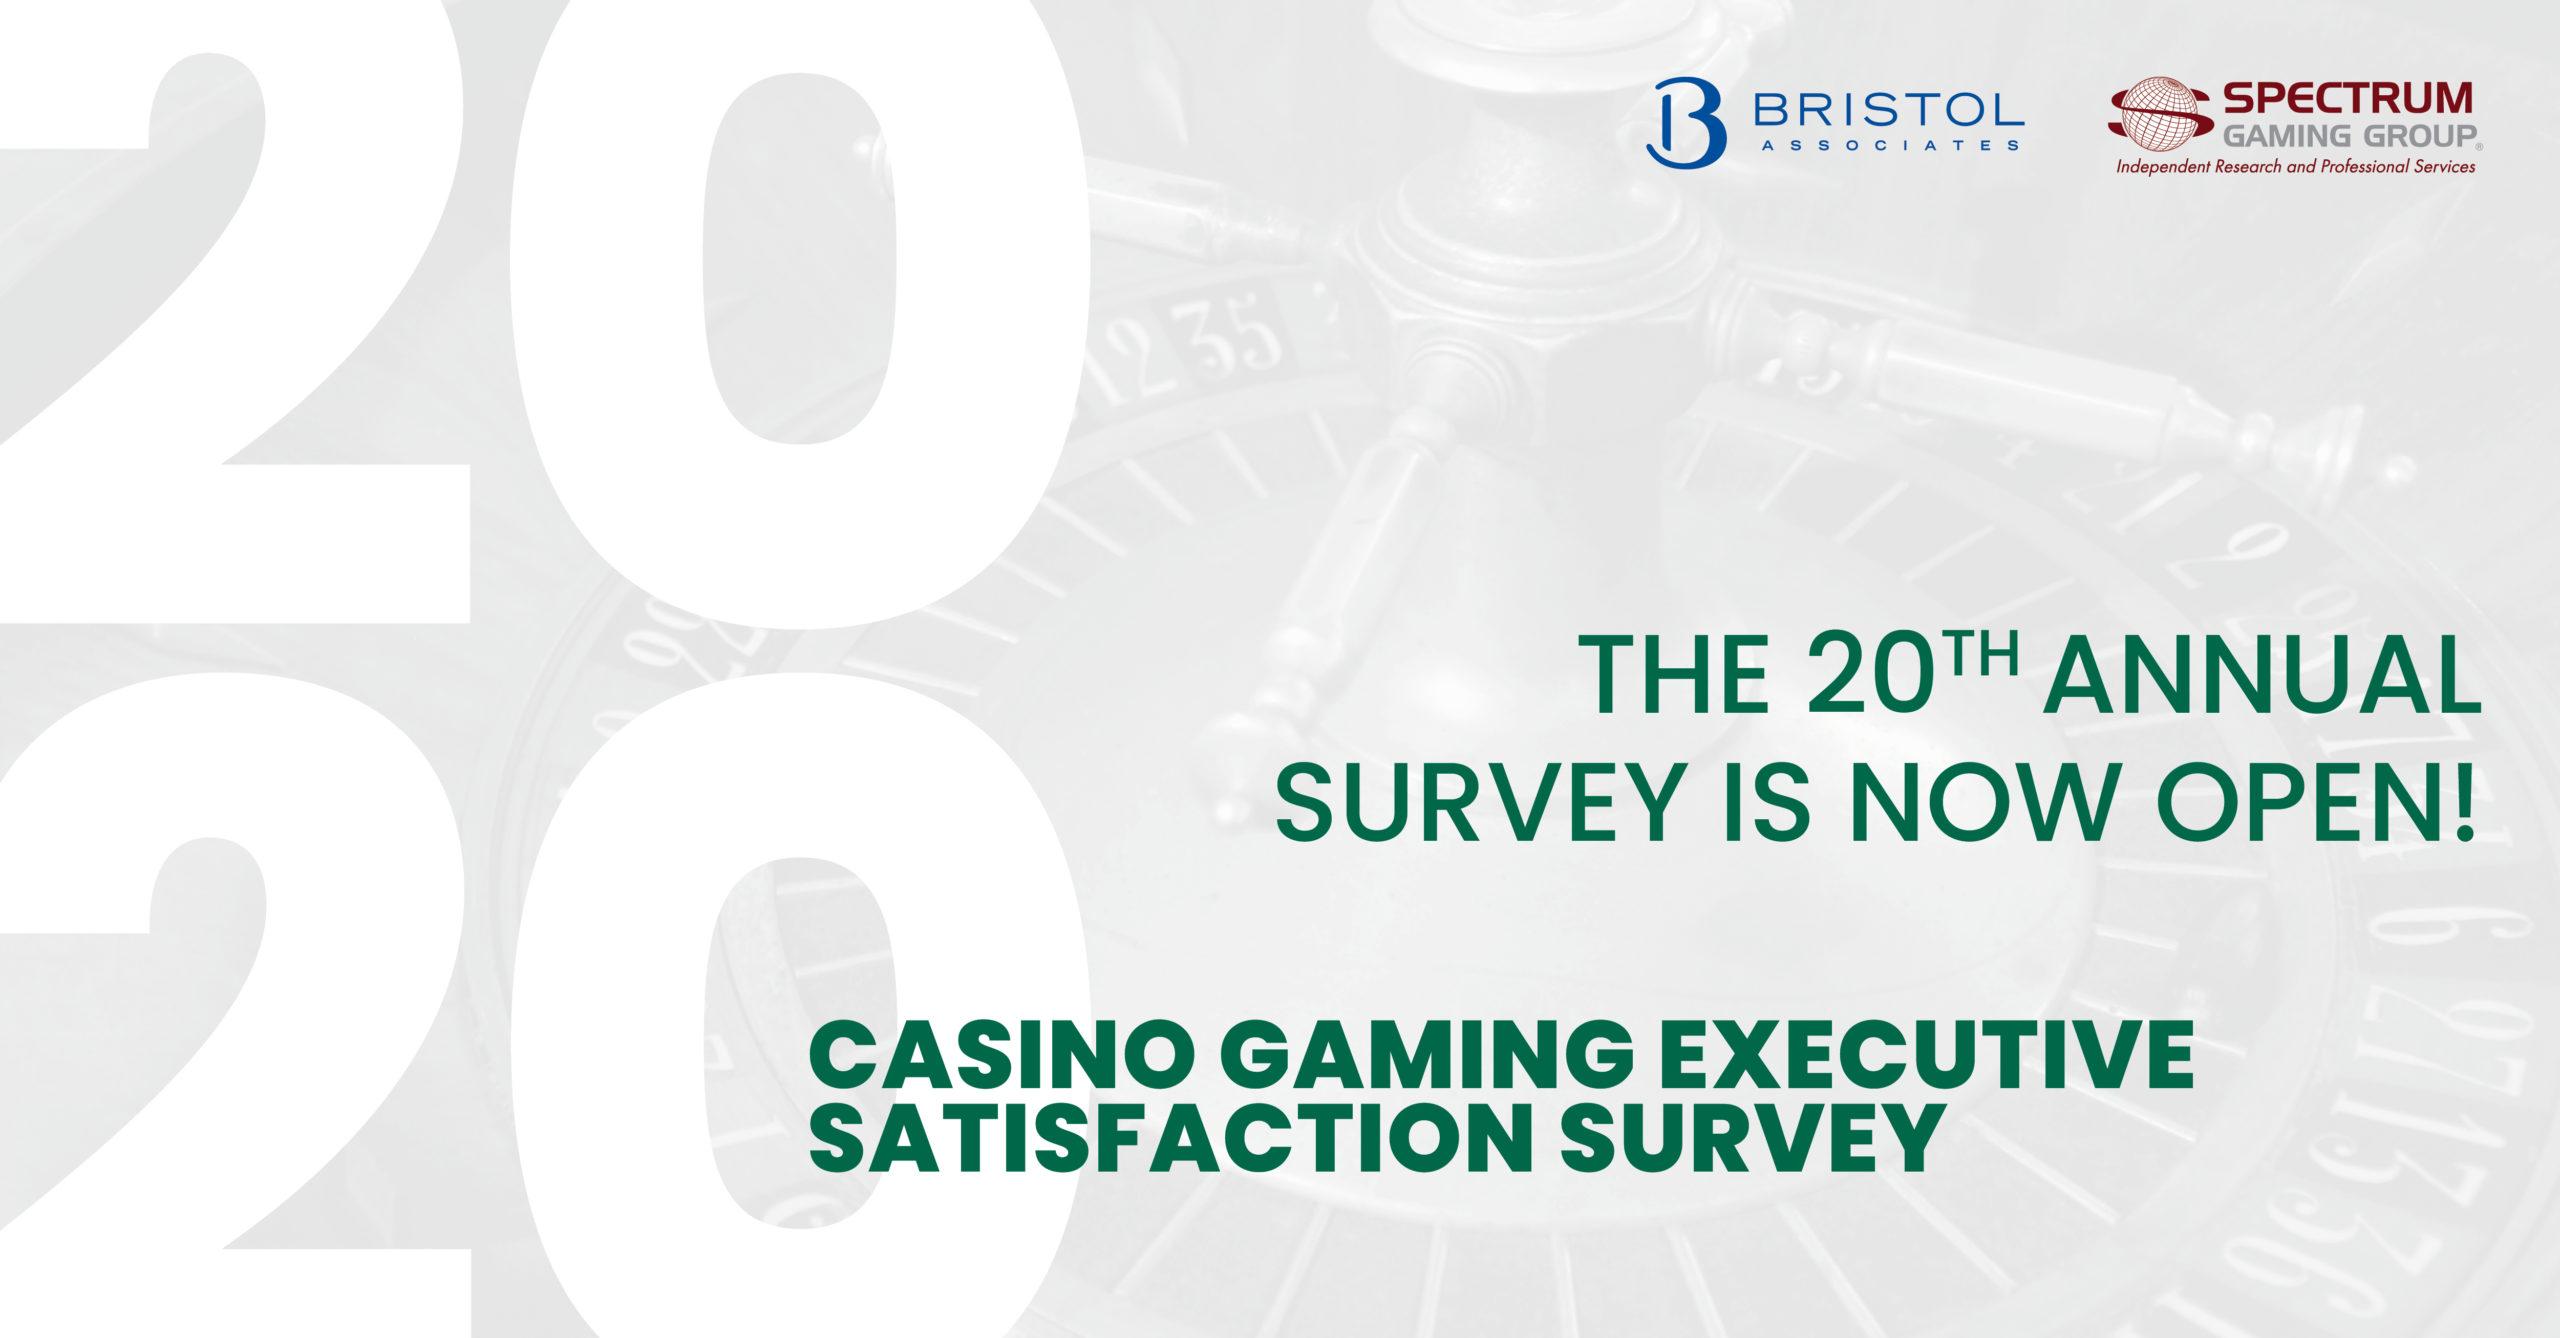 Casino Gaming Executive Satisfaction Survey 2020